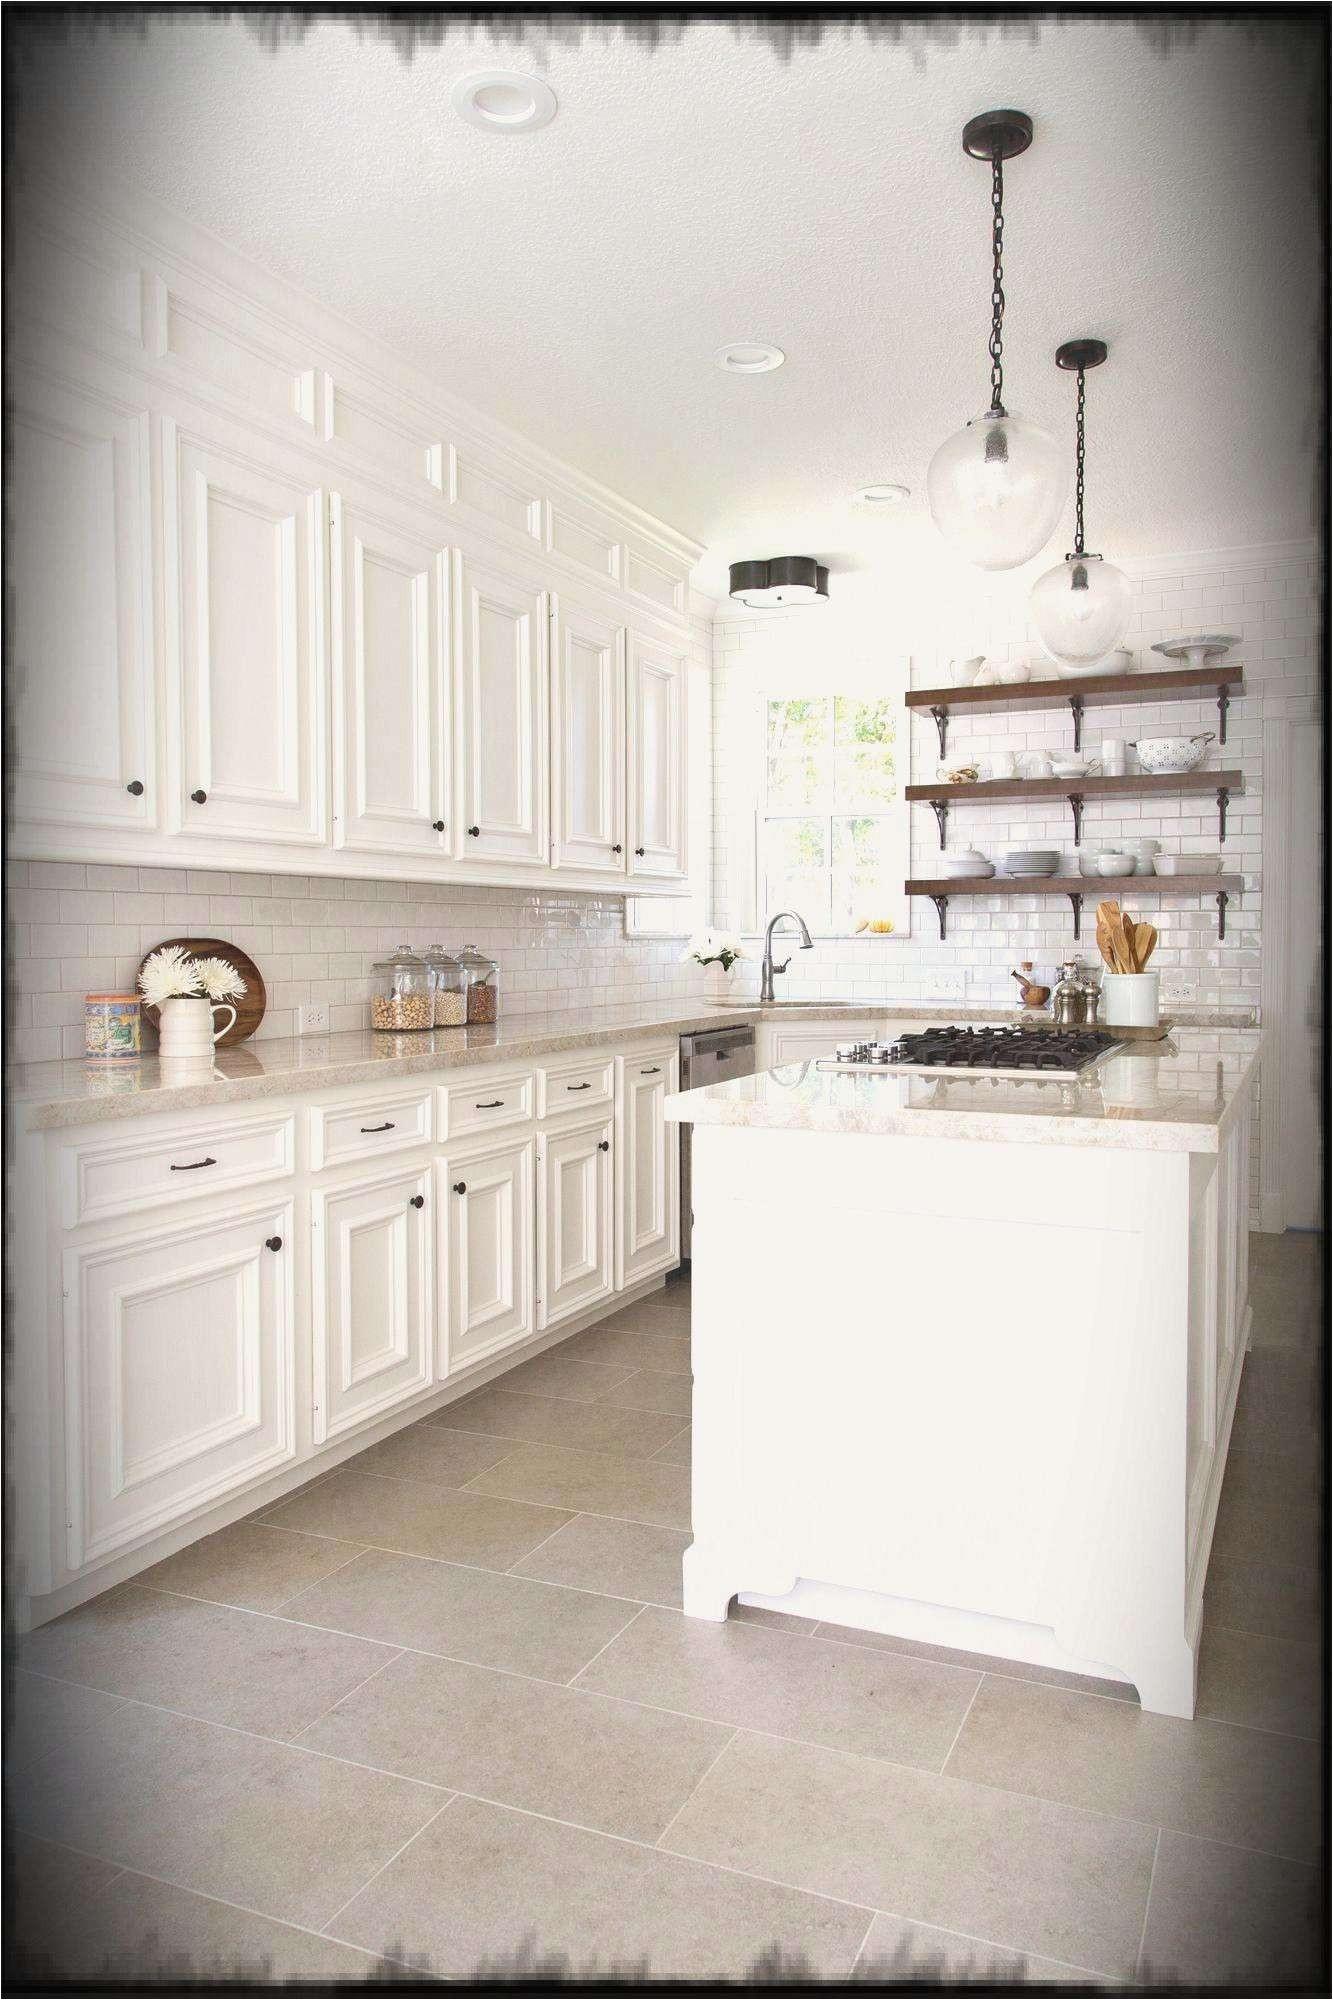 Small Apartment Kitchen Design Ideas Best Kitchen Layout Ideas Kitchen Belvoir Kitchens Belvoir Kitchens 0d